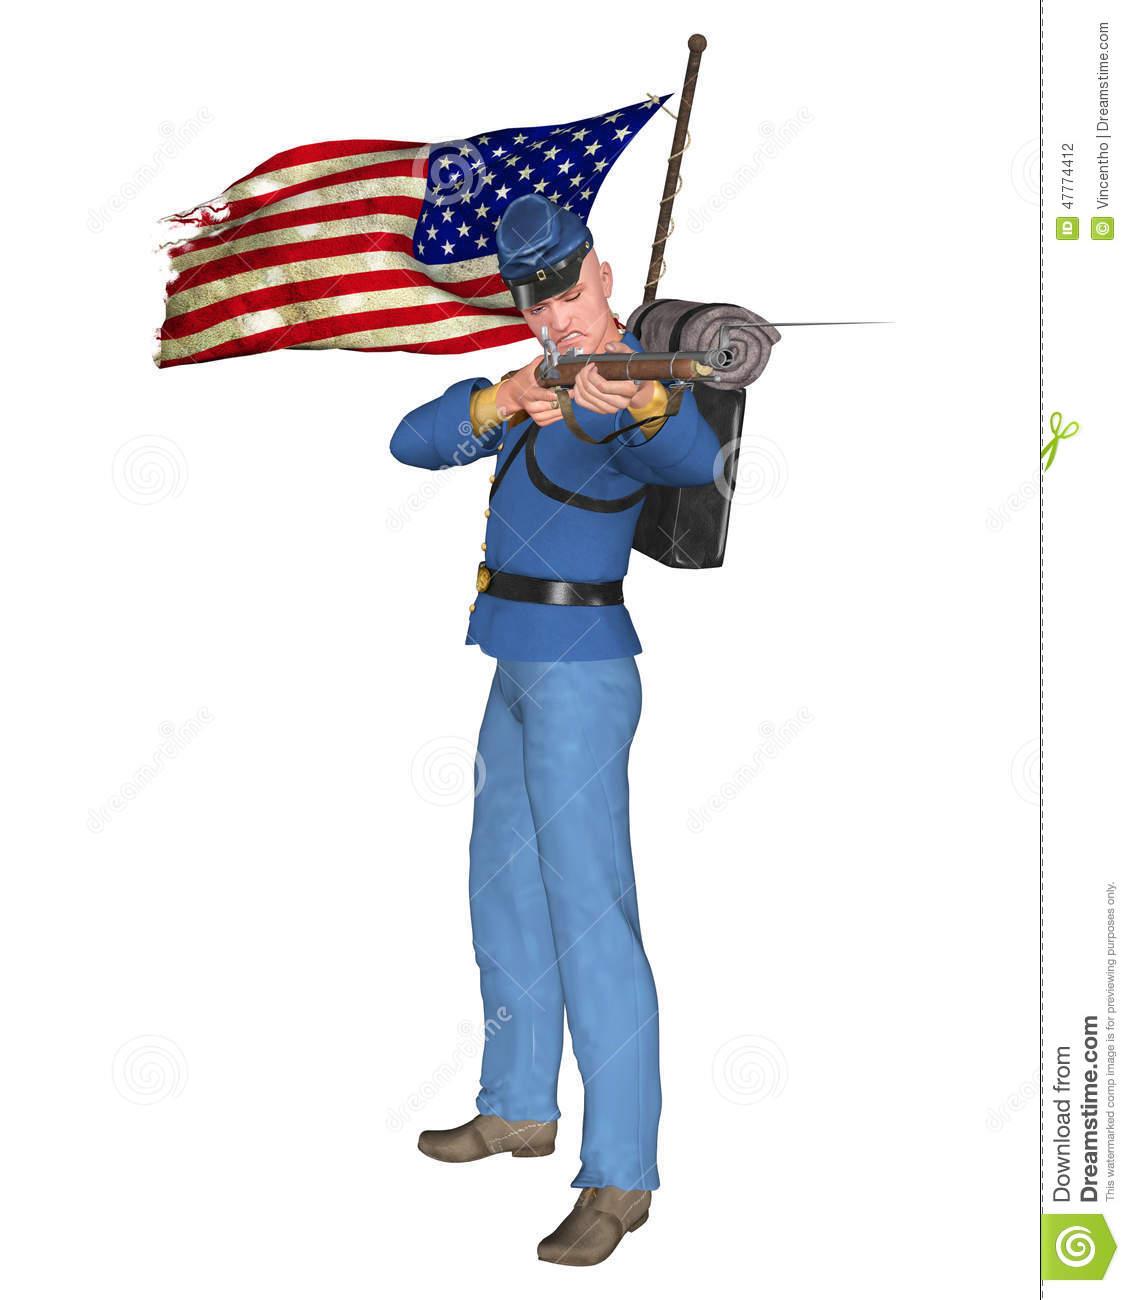 Union civil war general clipart banner transparent stock Civil War Soldier Drawing | Free download best Civil War ... banner transparent stock